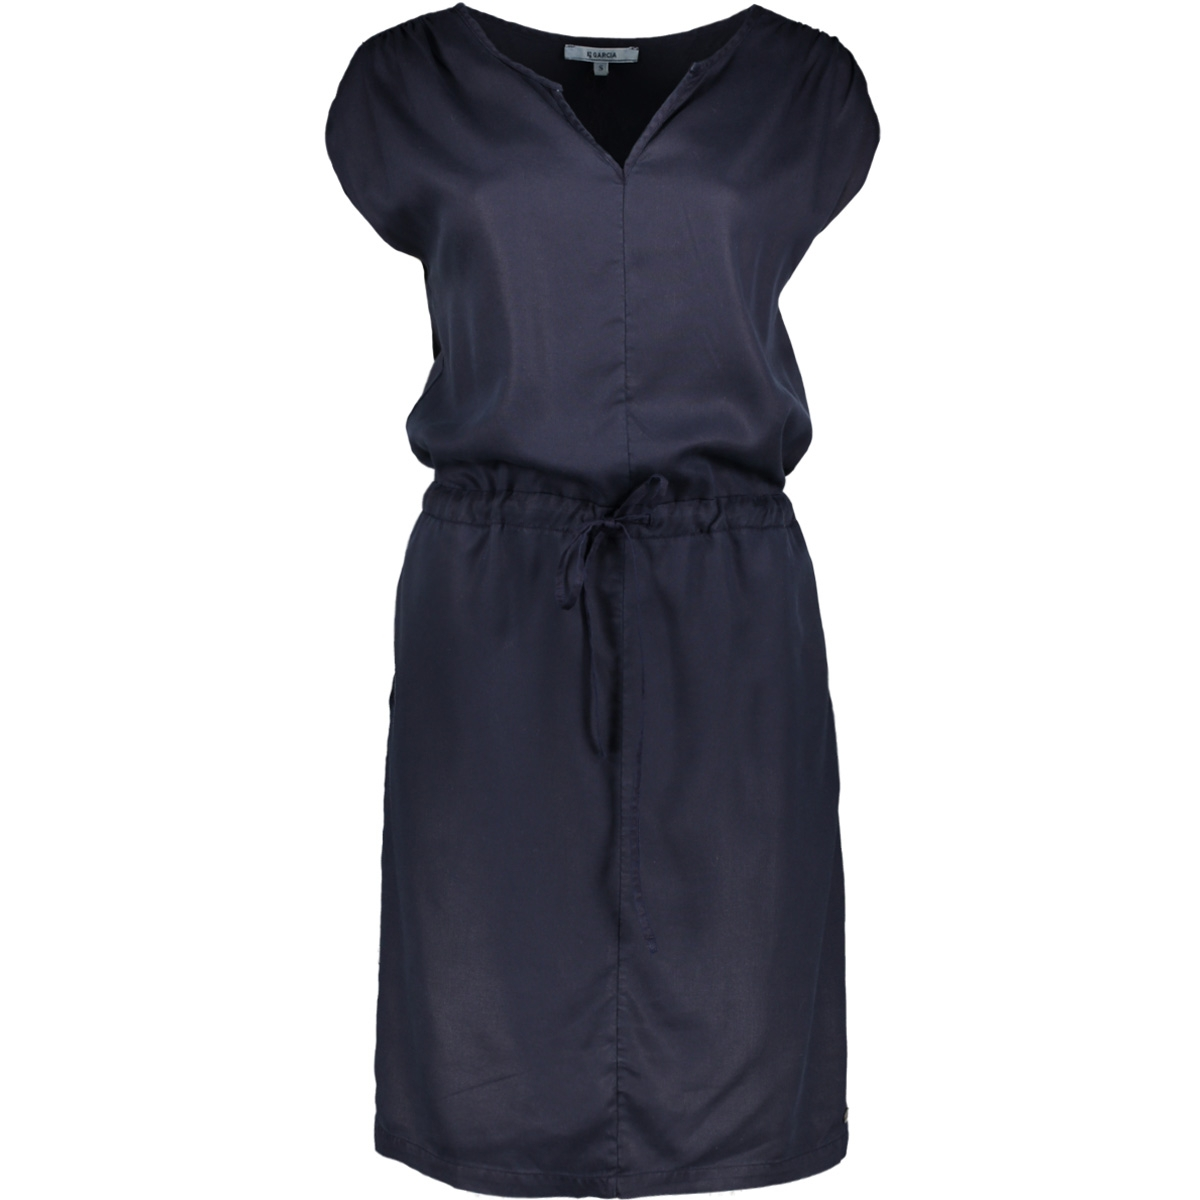 donkerblauw jurkje met taillekoord gs900382 garcia jurk 292 dark moon